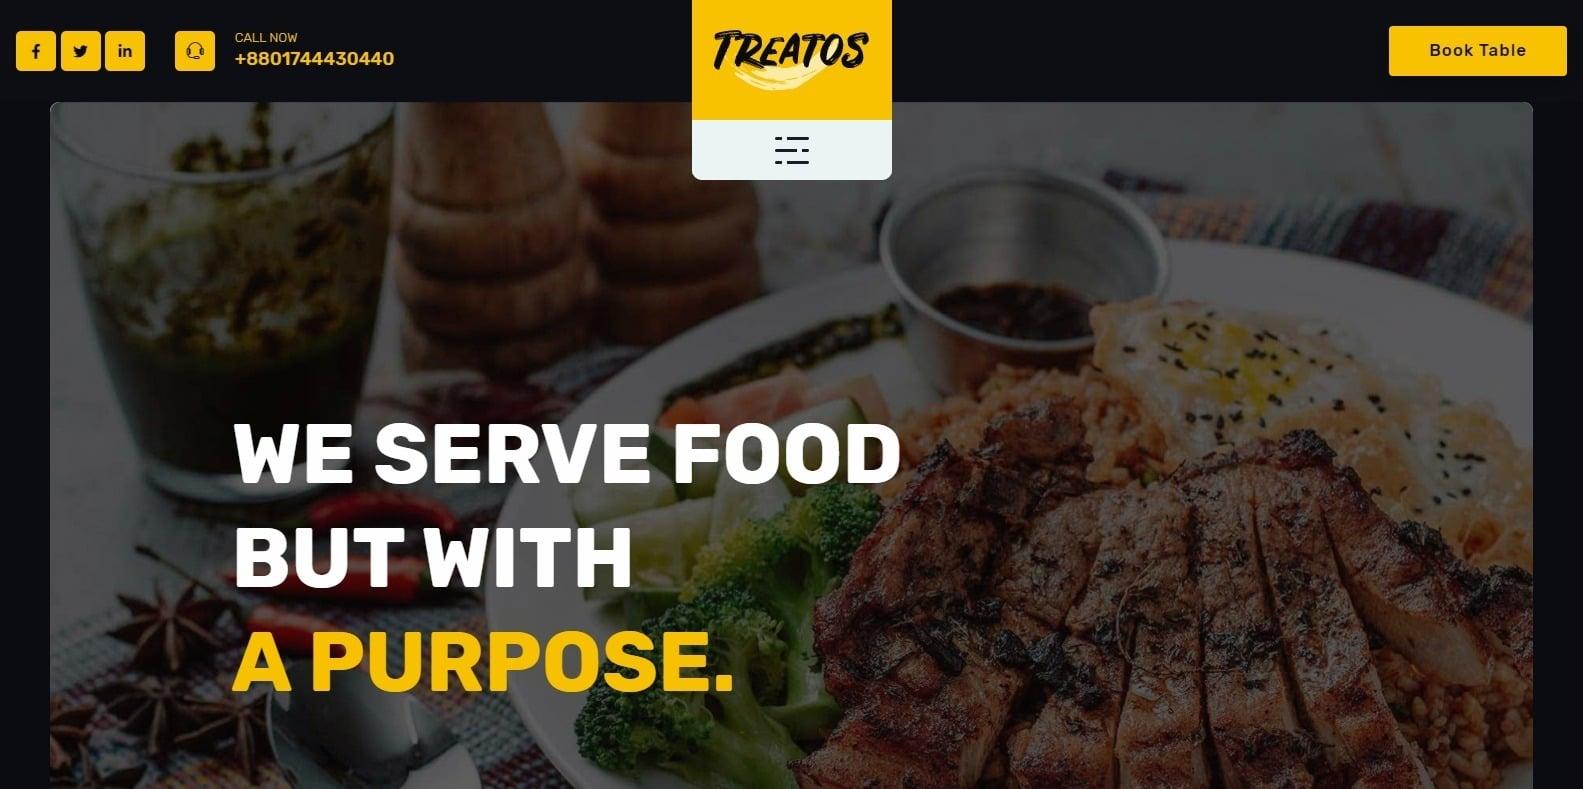 treatos-restaurant-website-template